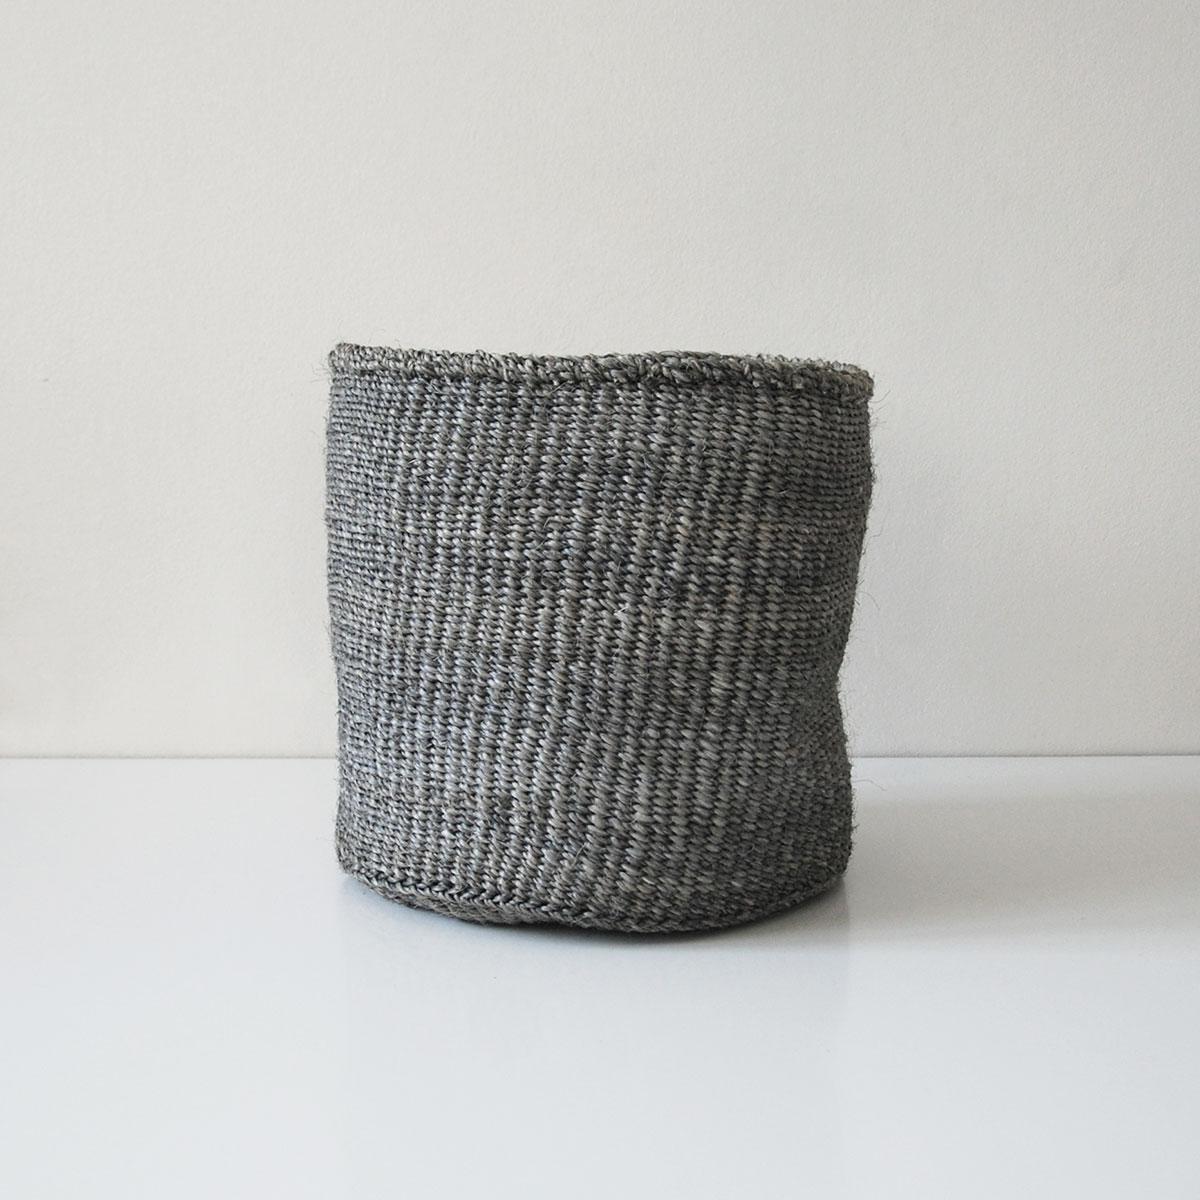 Planter-large-grey01